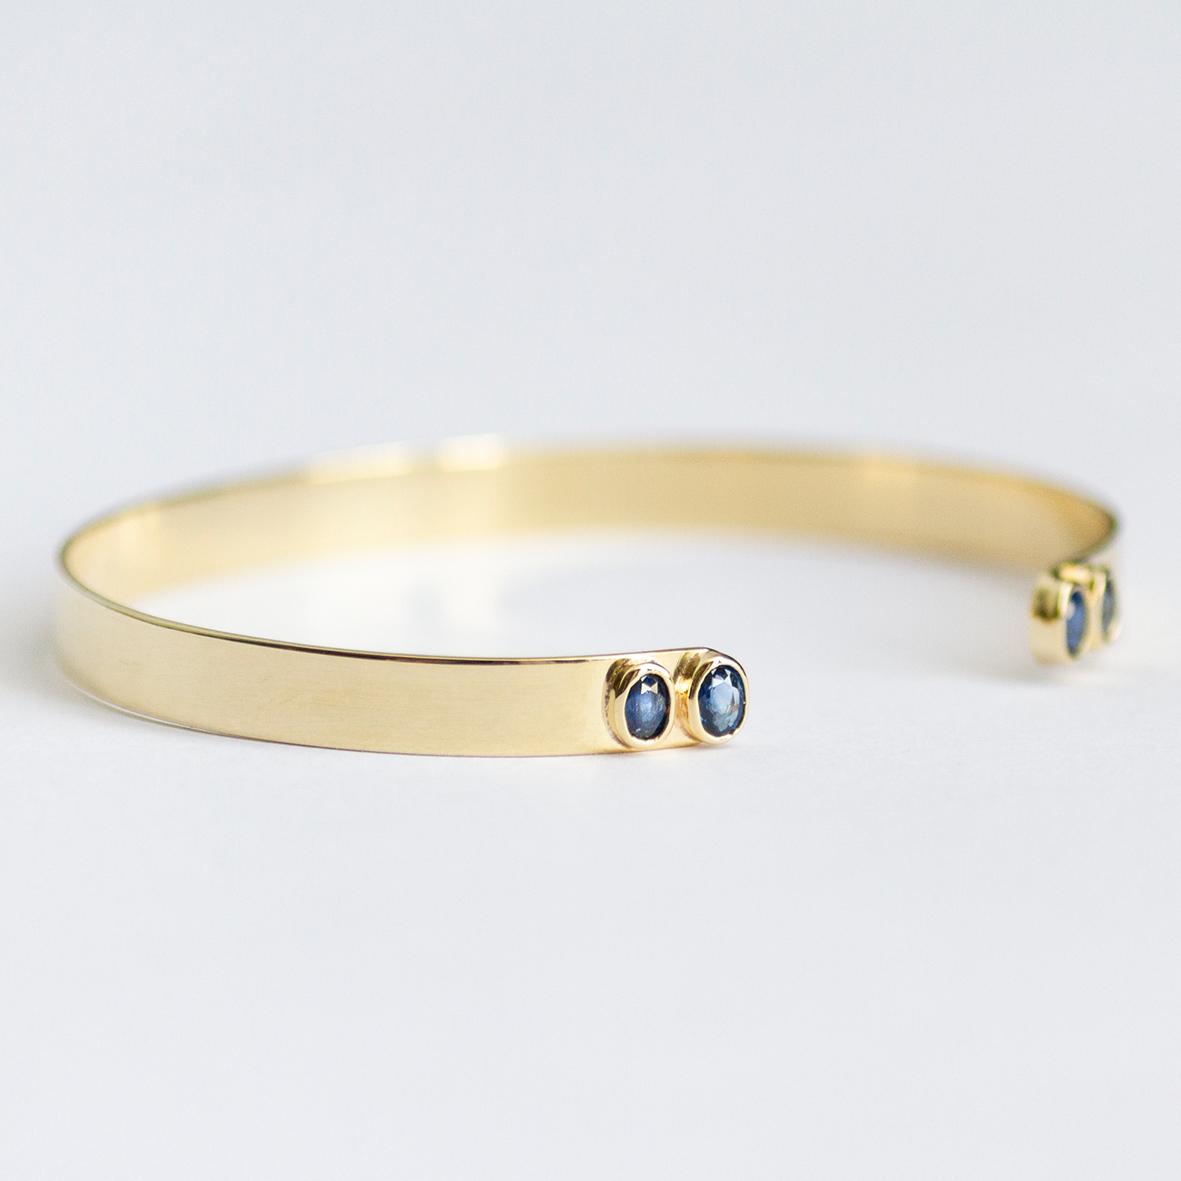 1. OONA_lotus_ficha2_blue sapphire bracelet